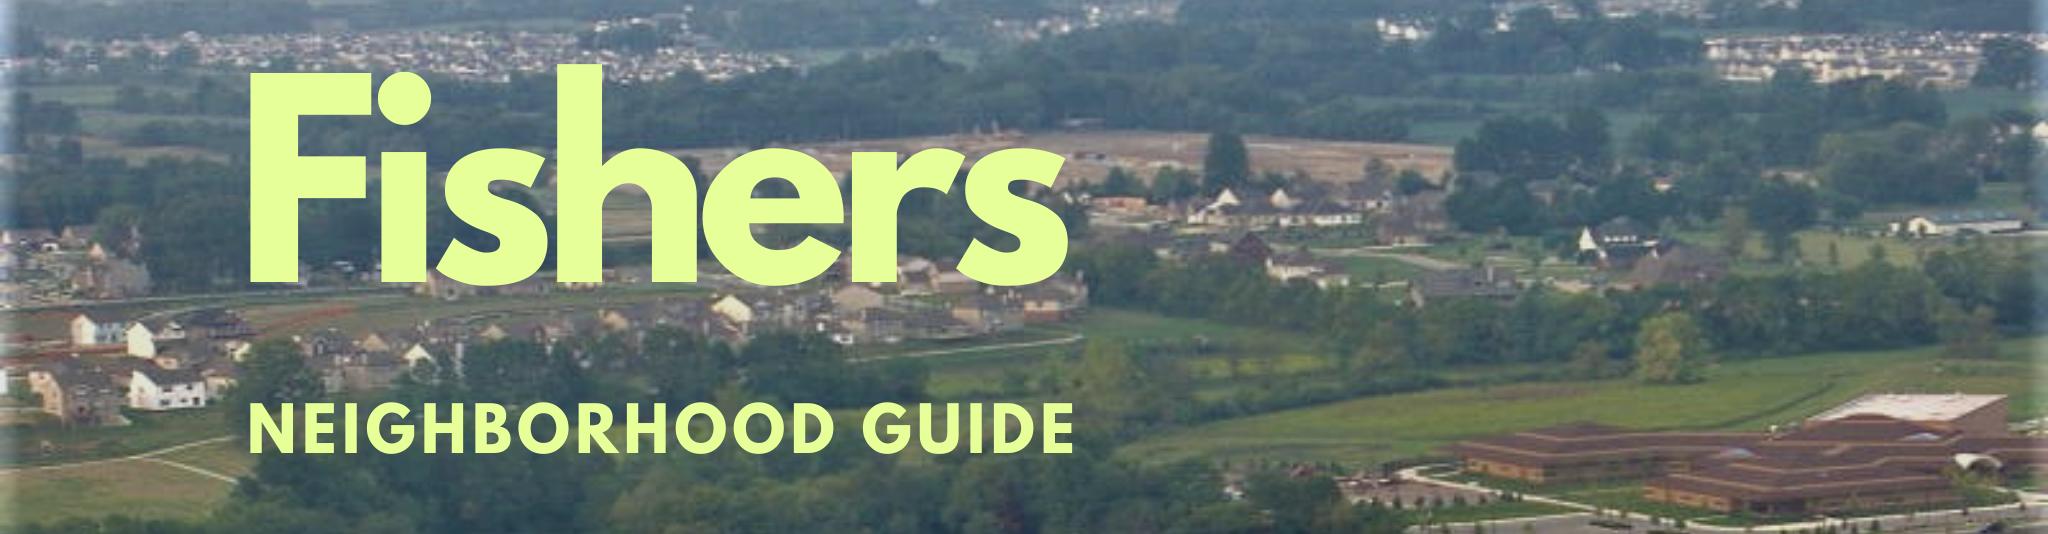 Fishers Indiana real estate neighborhood guide